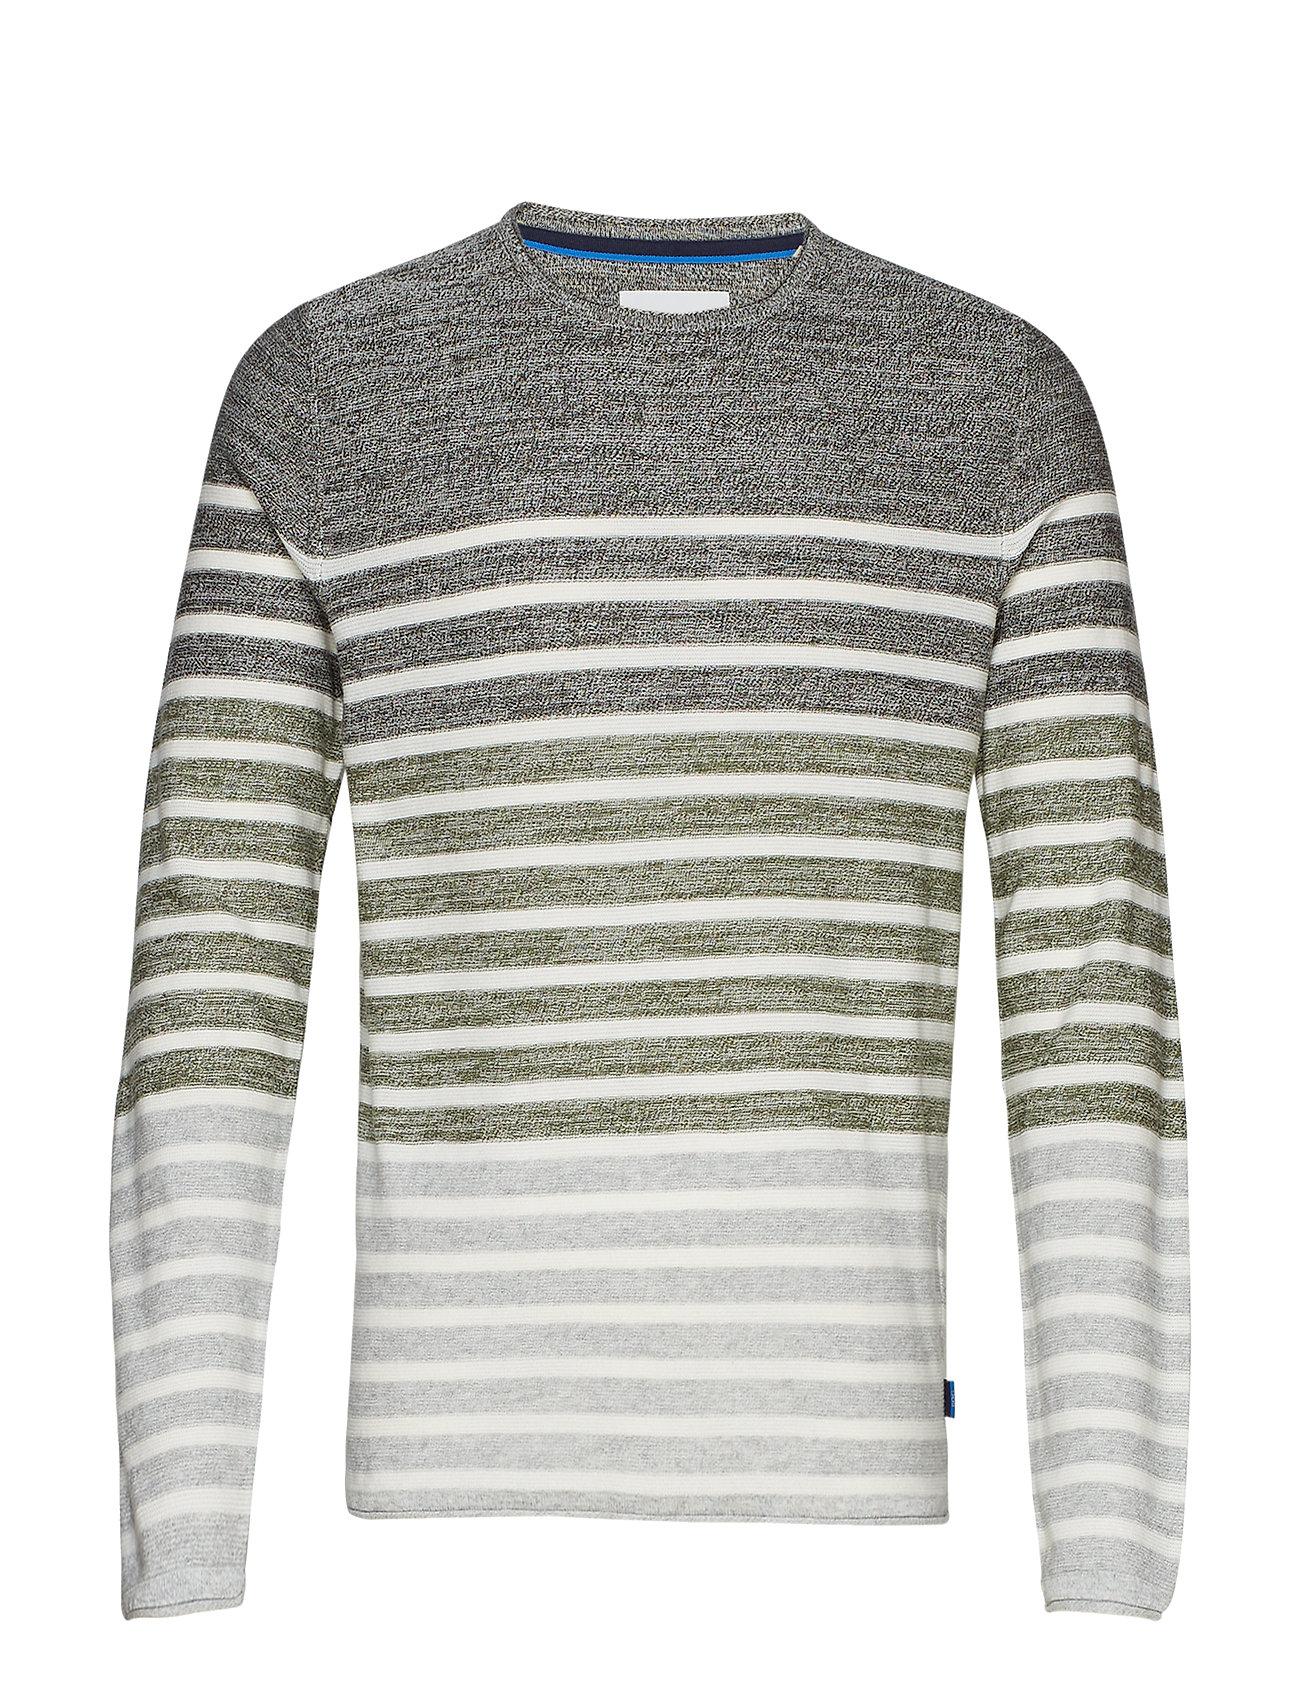 EDC by Esprit Sweaters - KHAKI GREEN